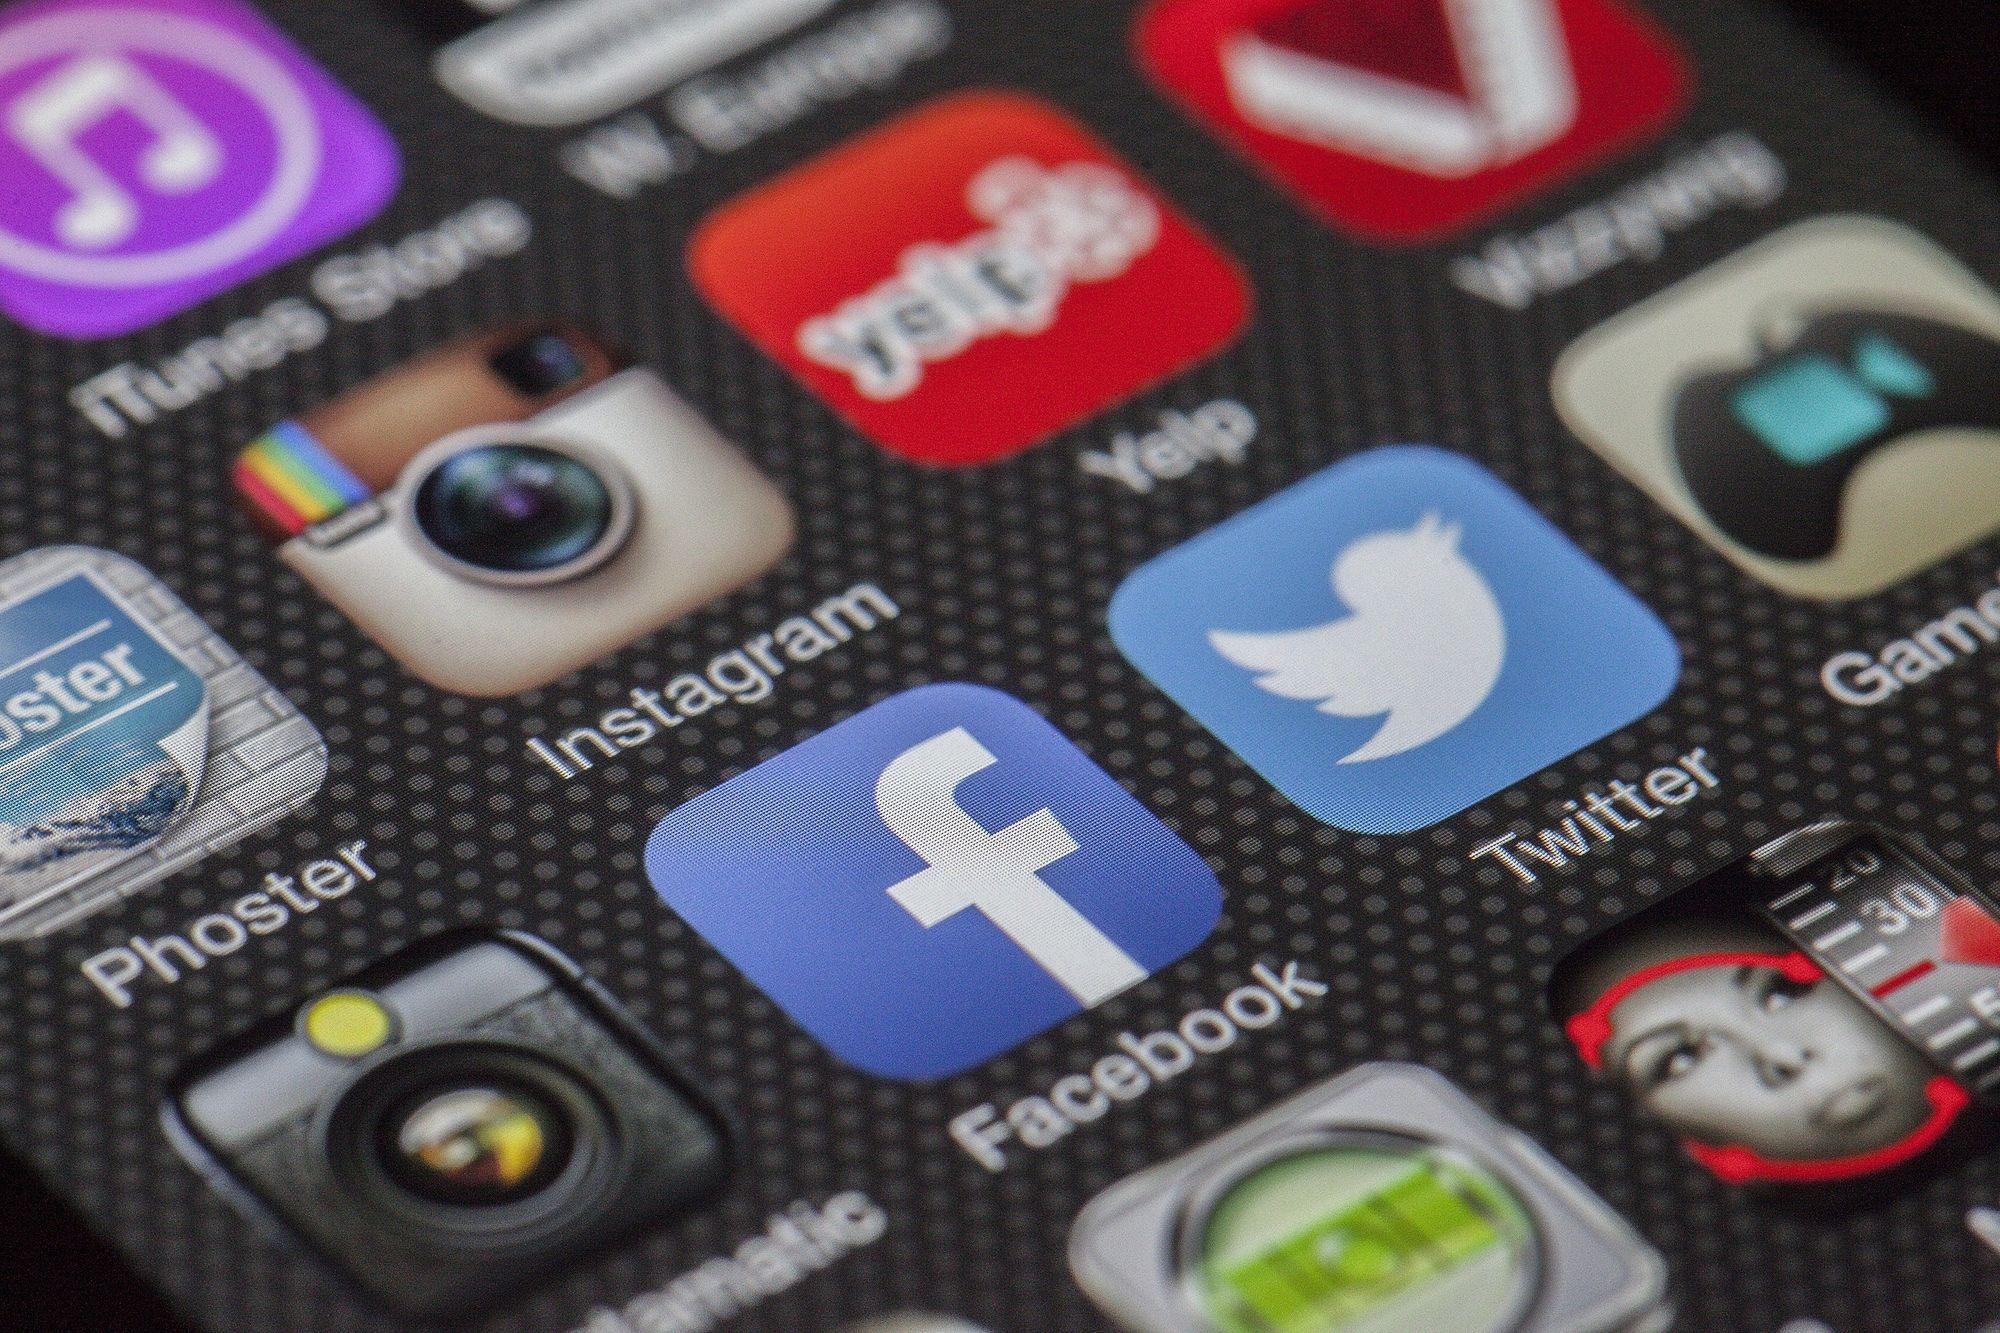 social media apps on a phone screen